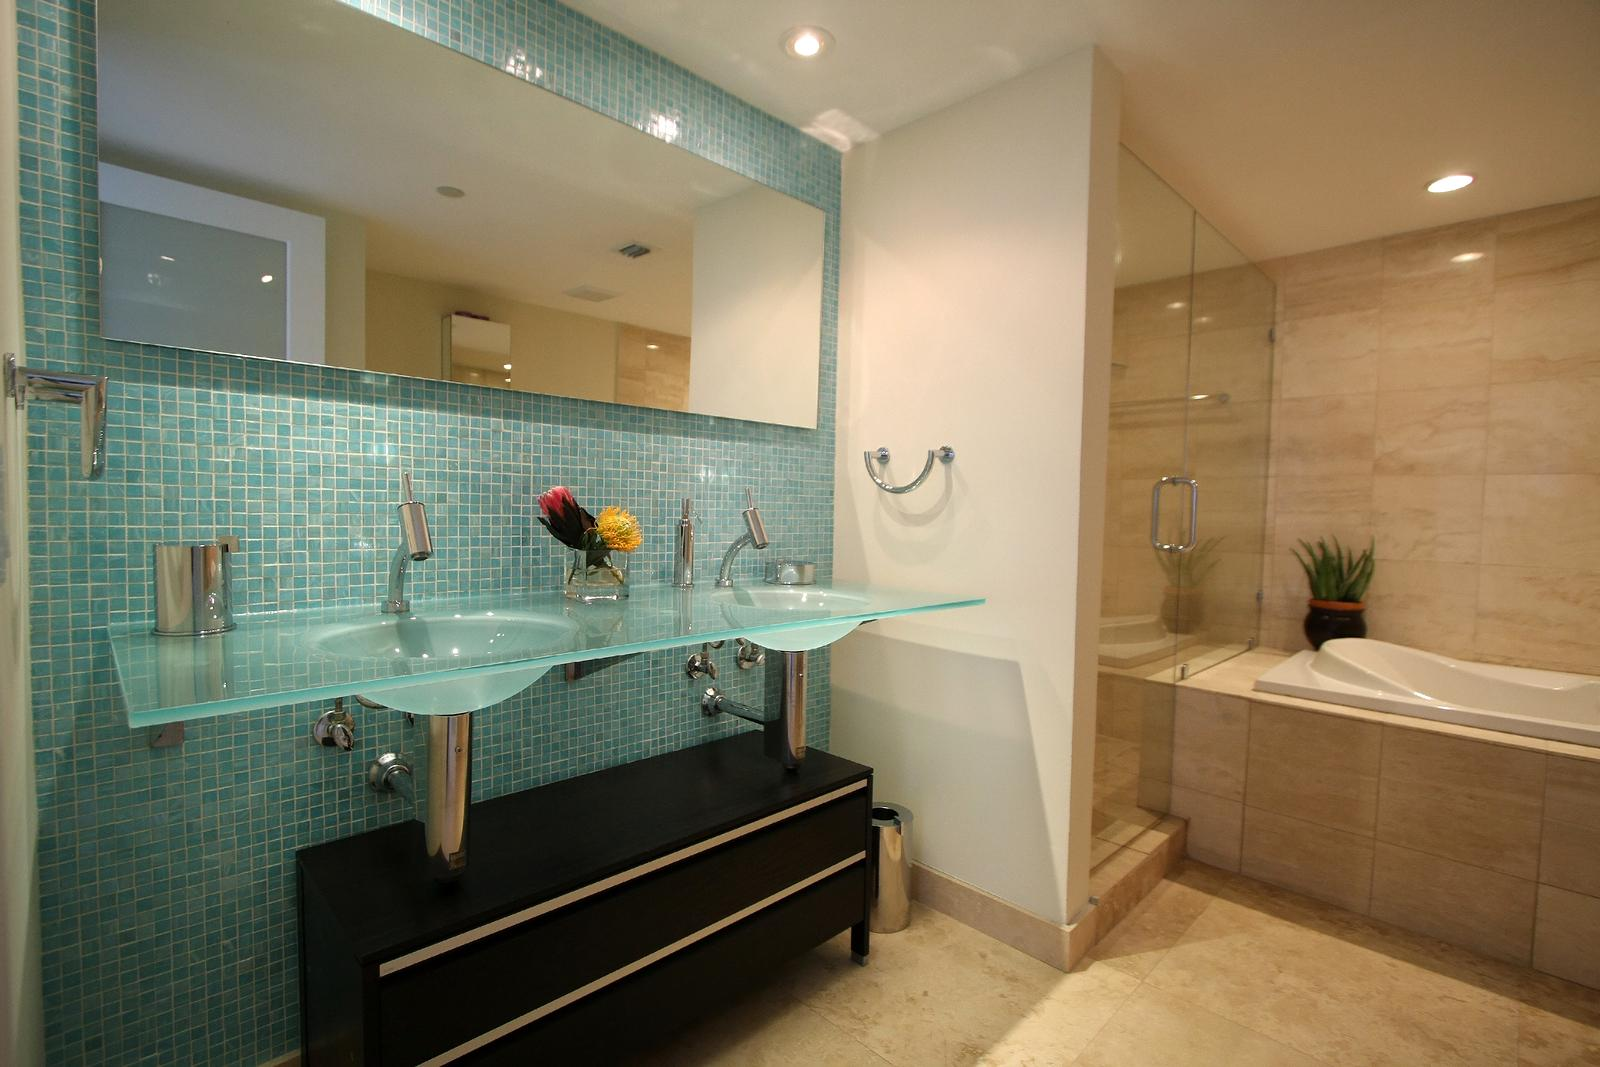 Bathroom Remodeling In Allentwon PA - Bathroom remodeling allentown pa